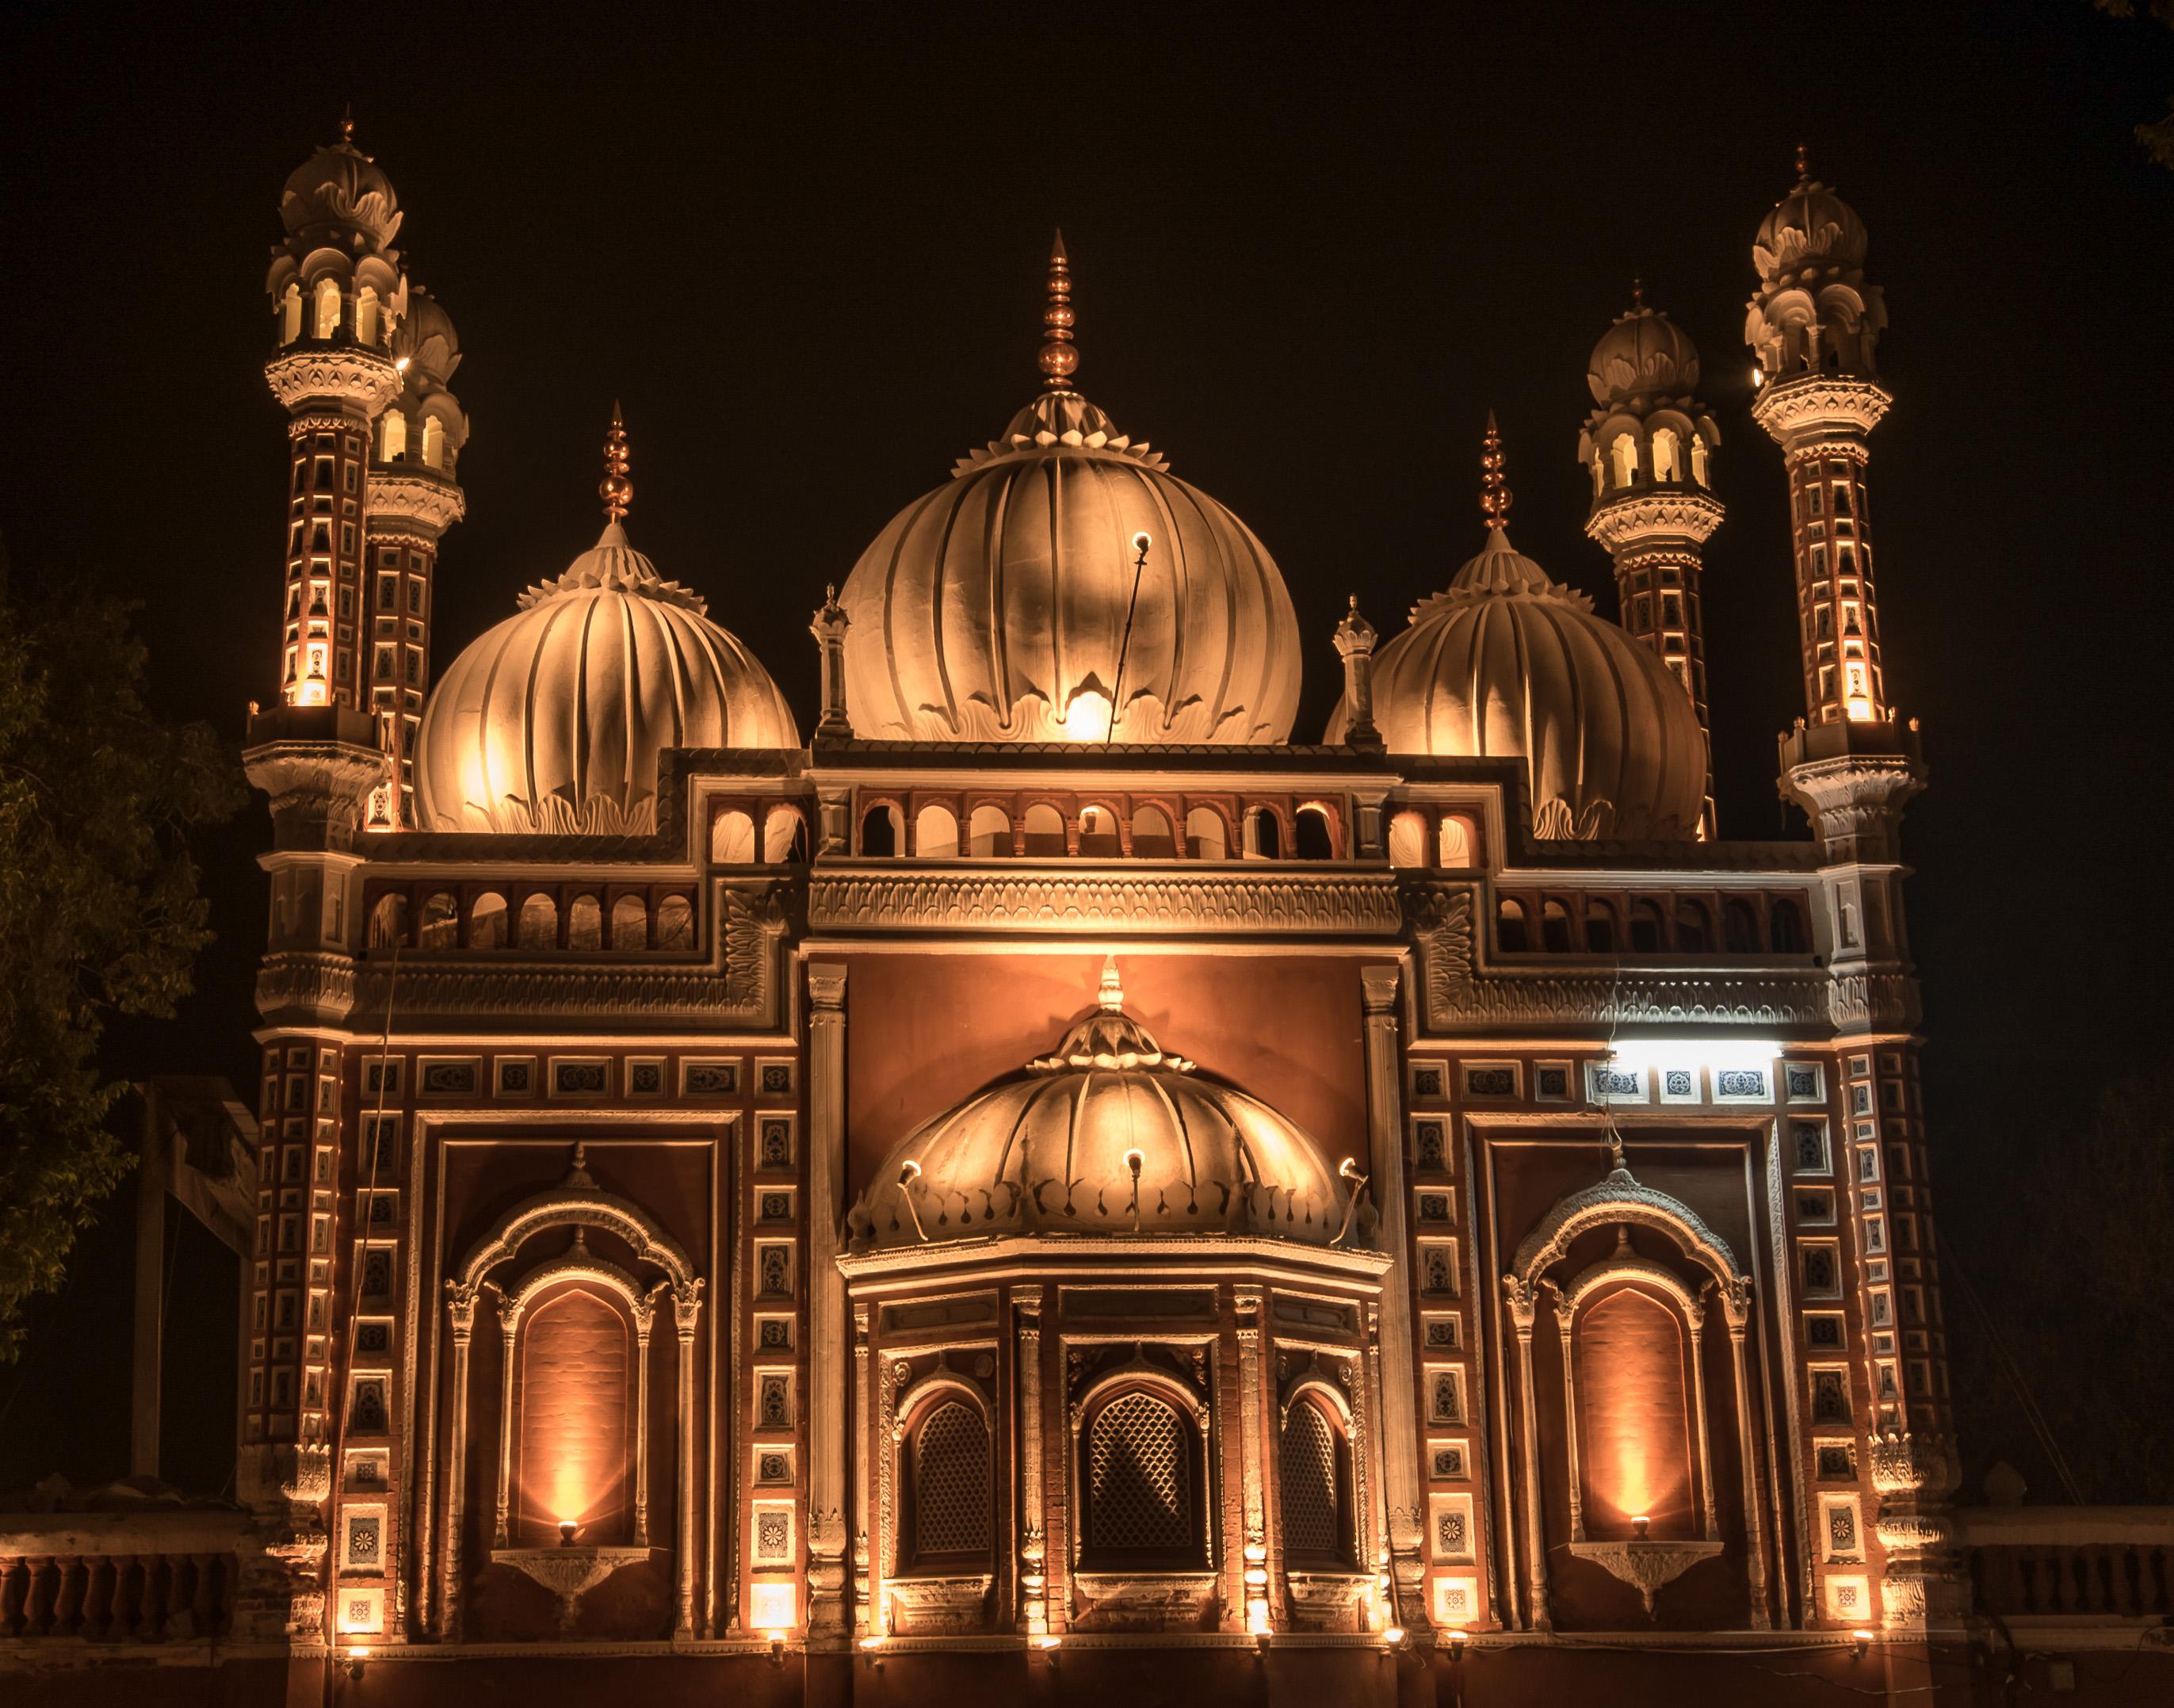 File:Darbar Mahal Mosque by Moiz.jpg - Wikimedia Commons